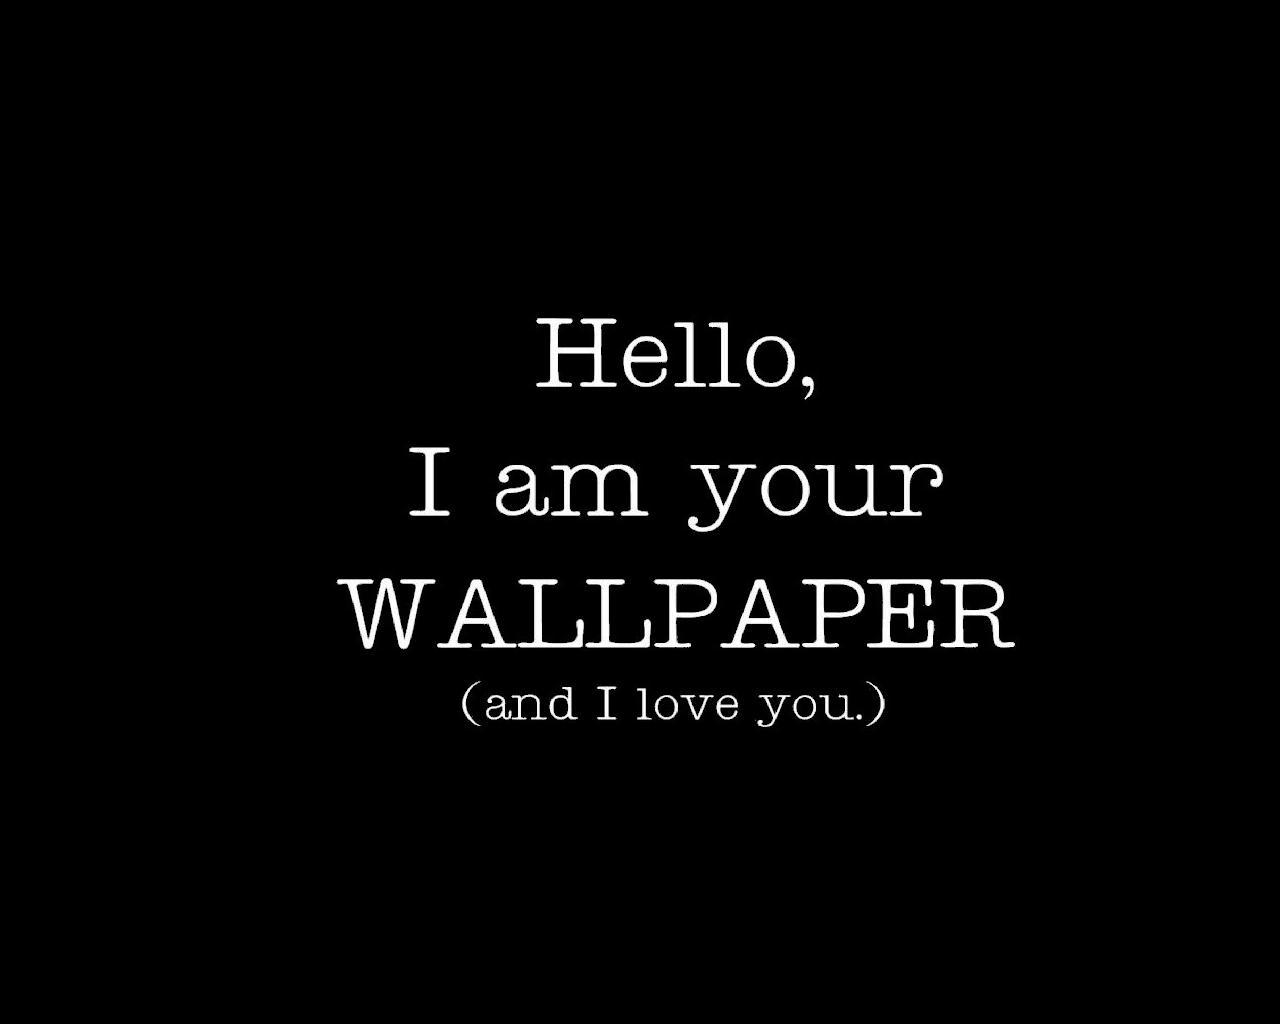 Funny Computer Wallpapers Desktop Backgrounds 1280x1024 ID4448 1280x1024